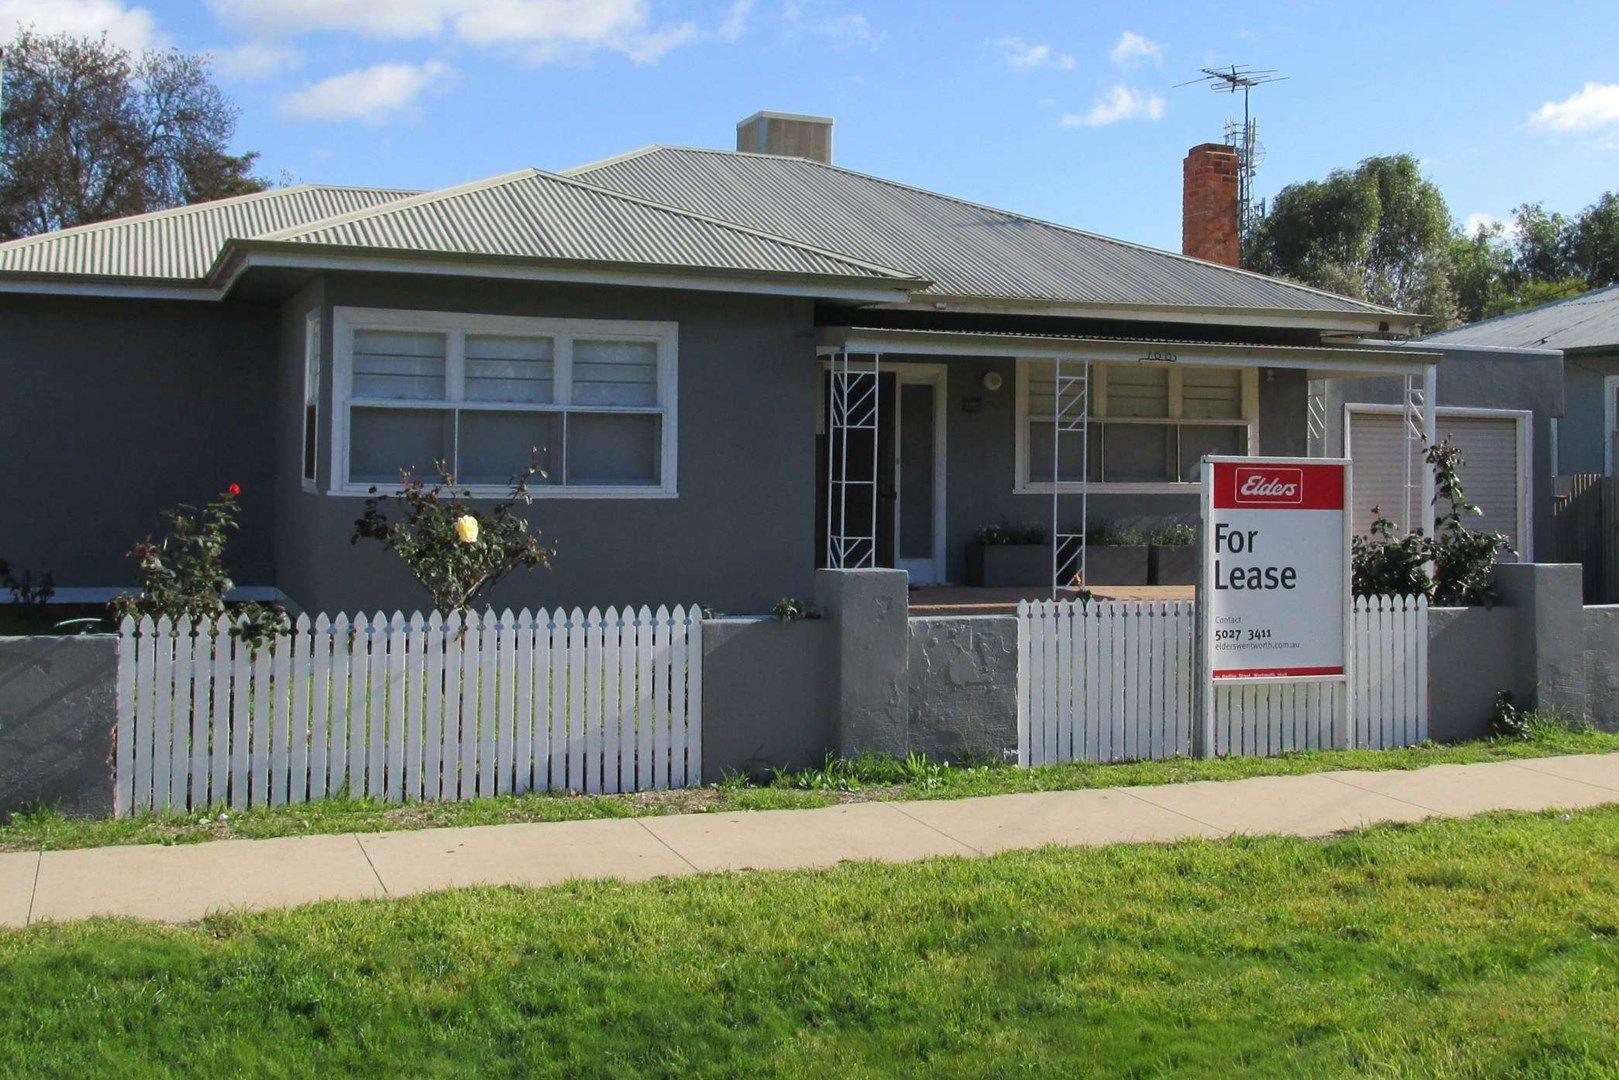 100 DARLING STREET, Wentworth NSW 2648, Image 0